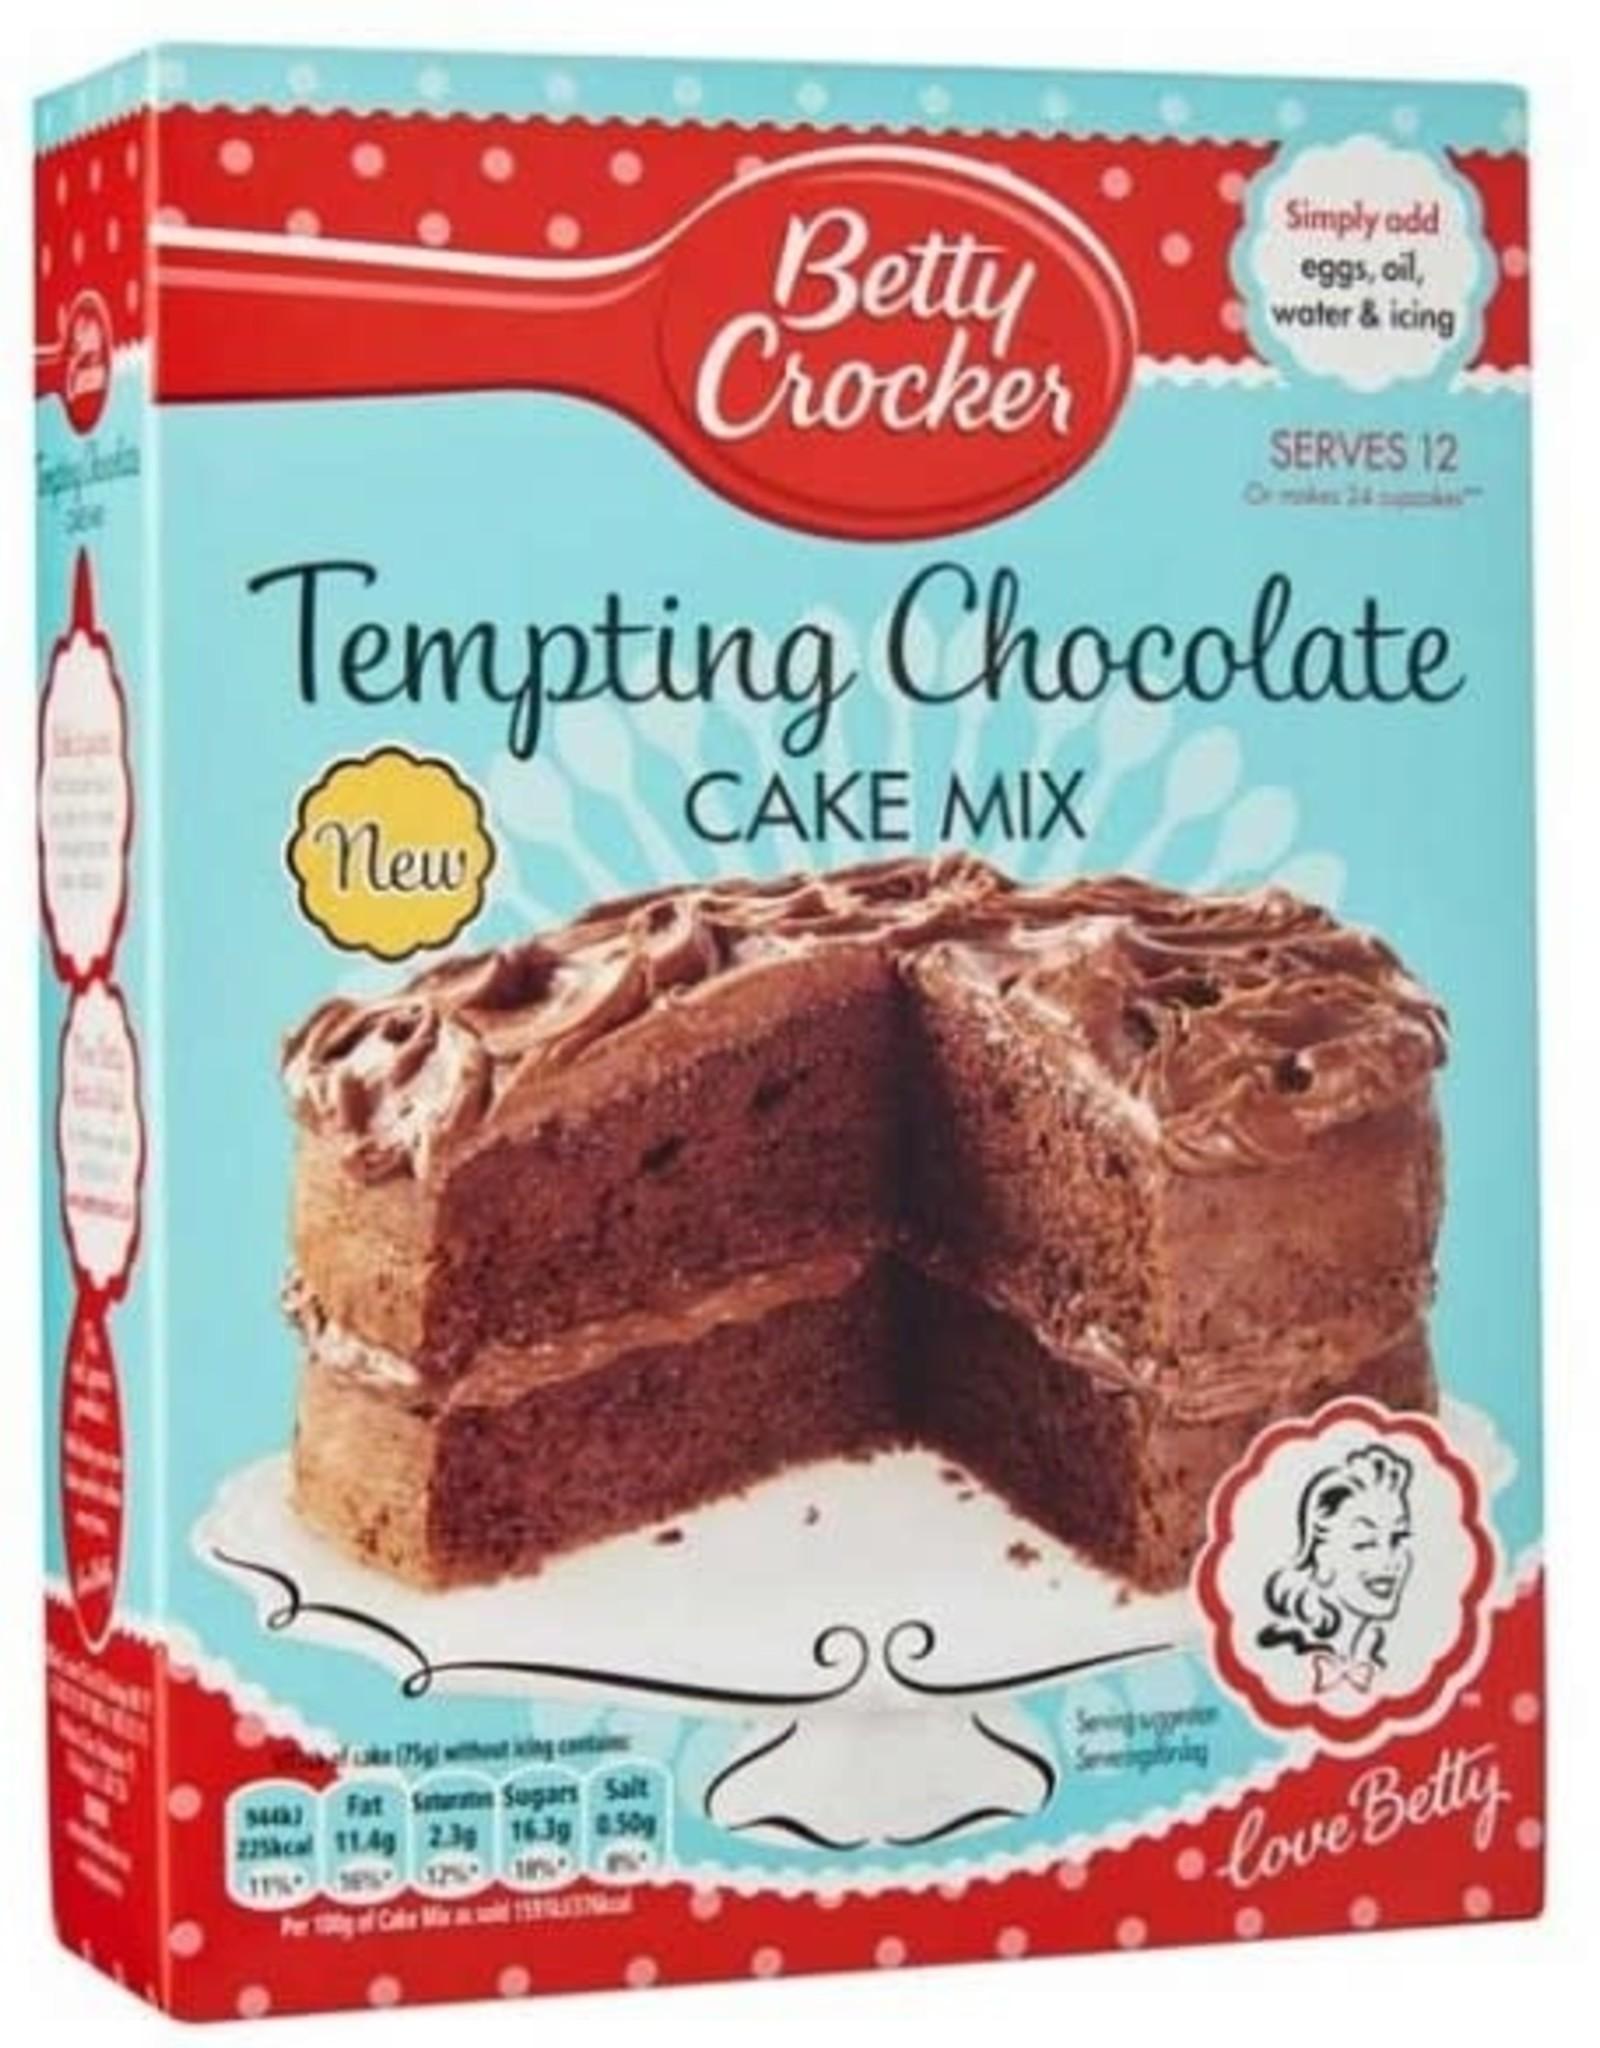 Betty Crocker Betty Crocker Tempting Chocolate Cake Mix